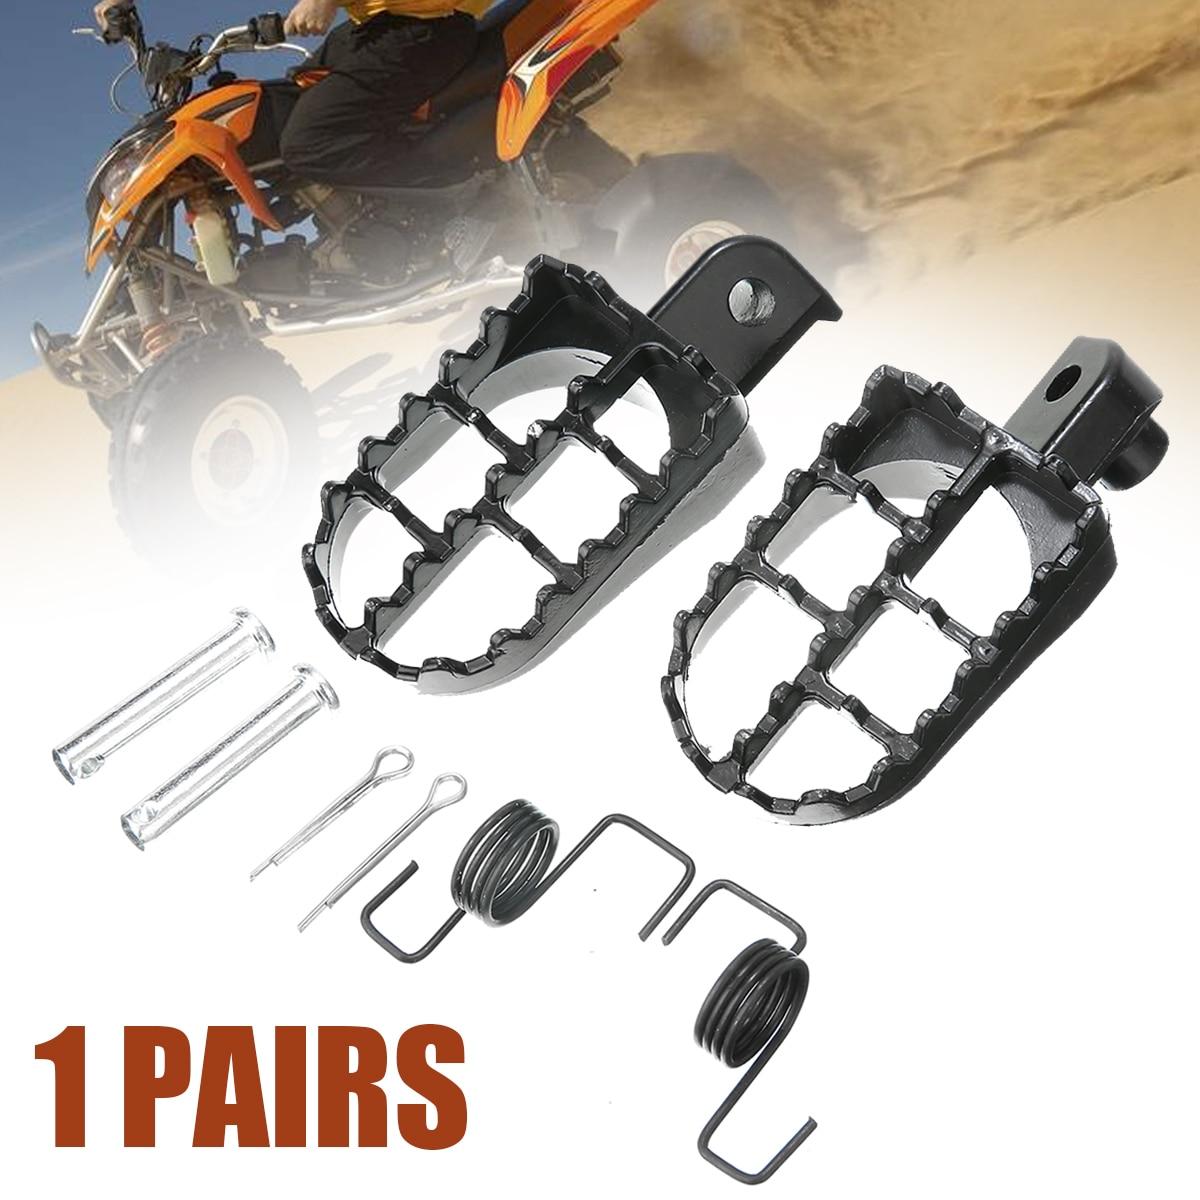 Mayitr 2pcs Black Pit Dirt Bike Foot Pegs Footrest For Yamaha PW50 PW80 Honda XR CRF 50/70